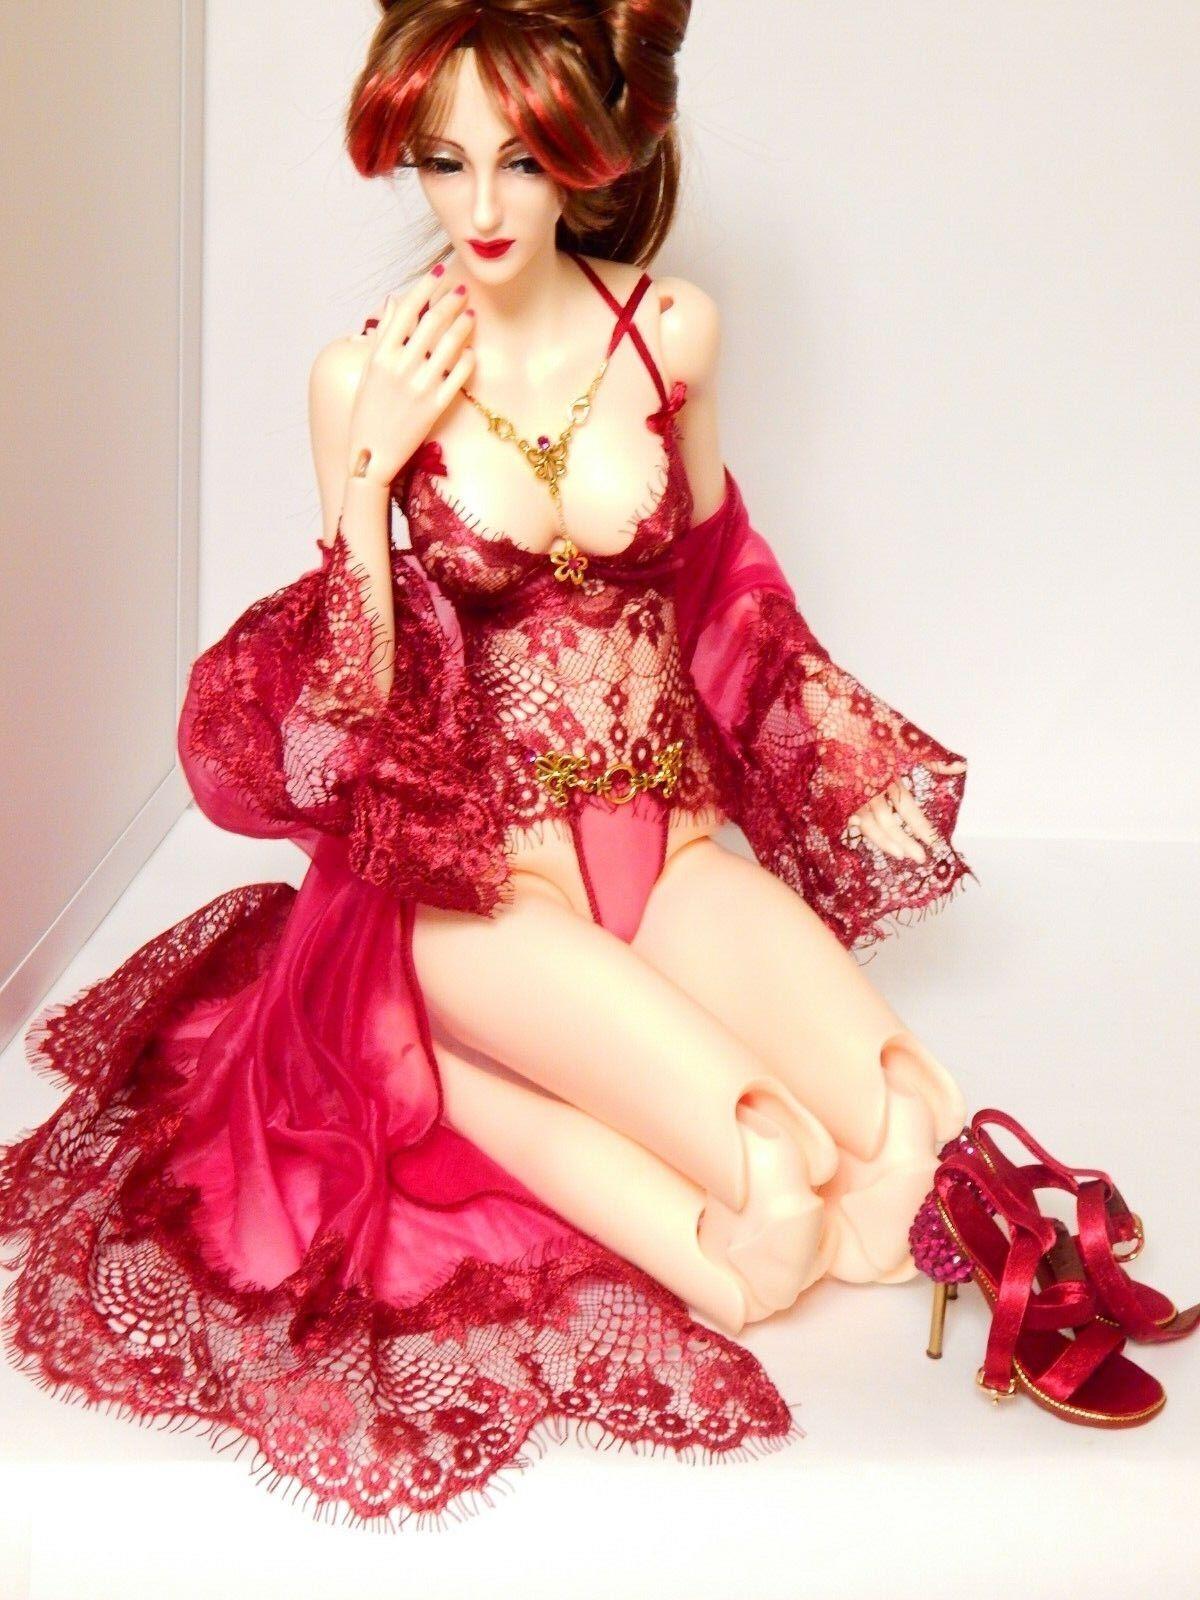 Negligee peigschwarz dress Doll, DollShe Craft, 65 sm., BJD 1 3 SD outfit Clothing